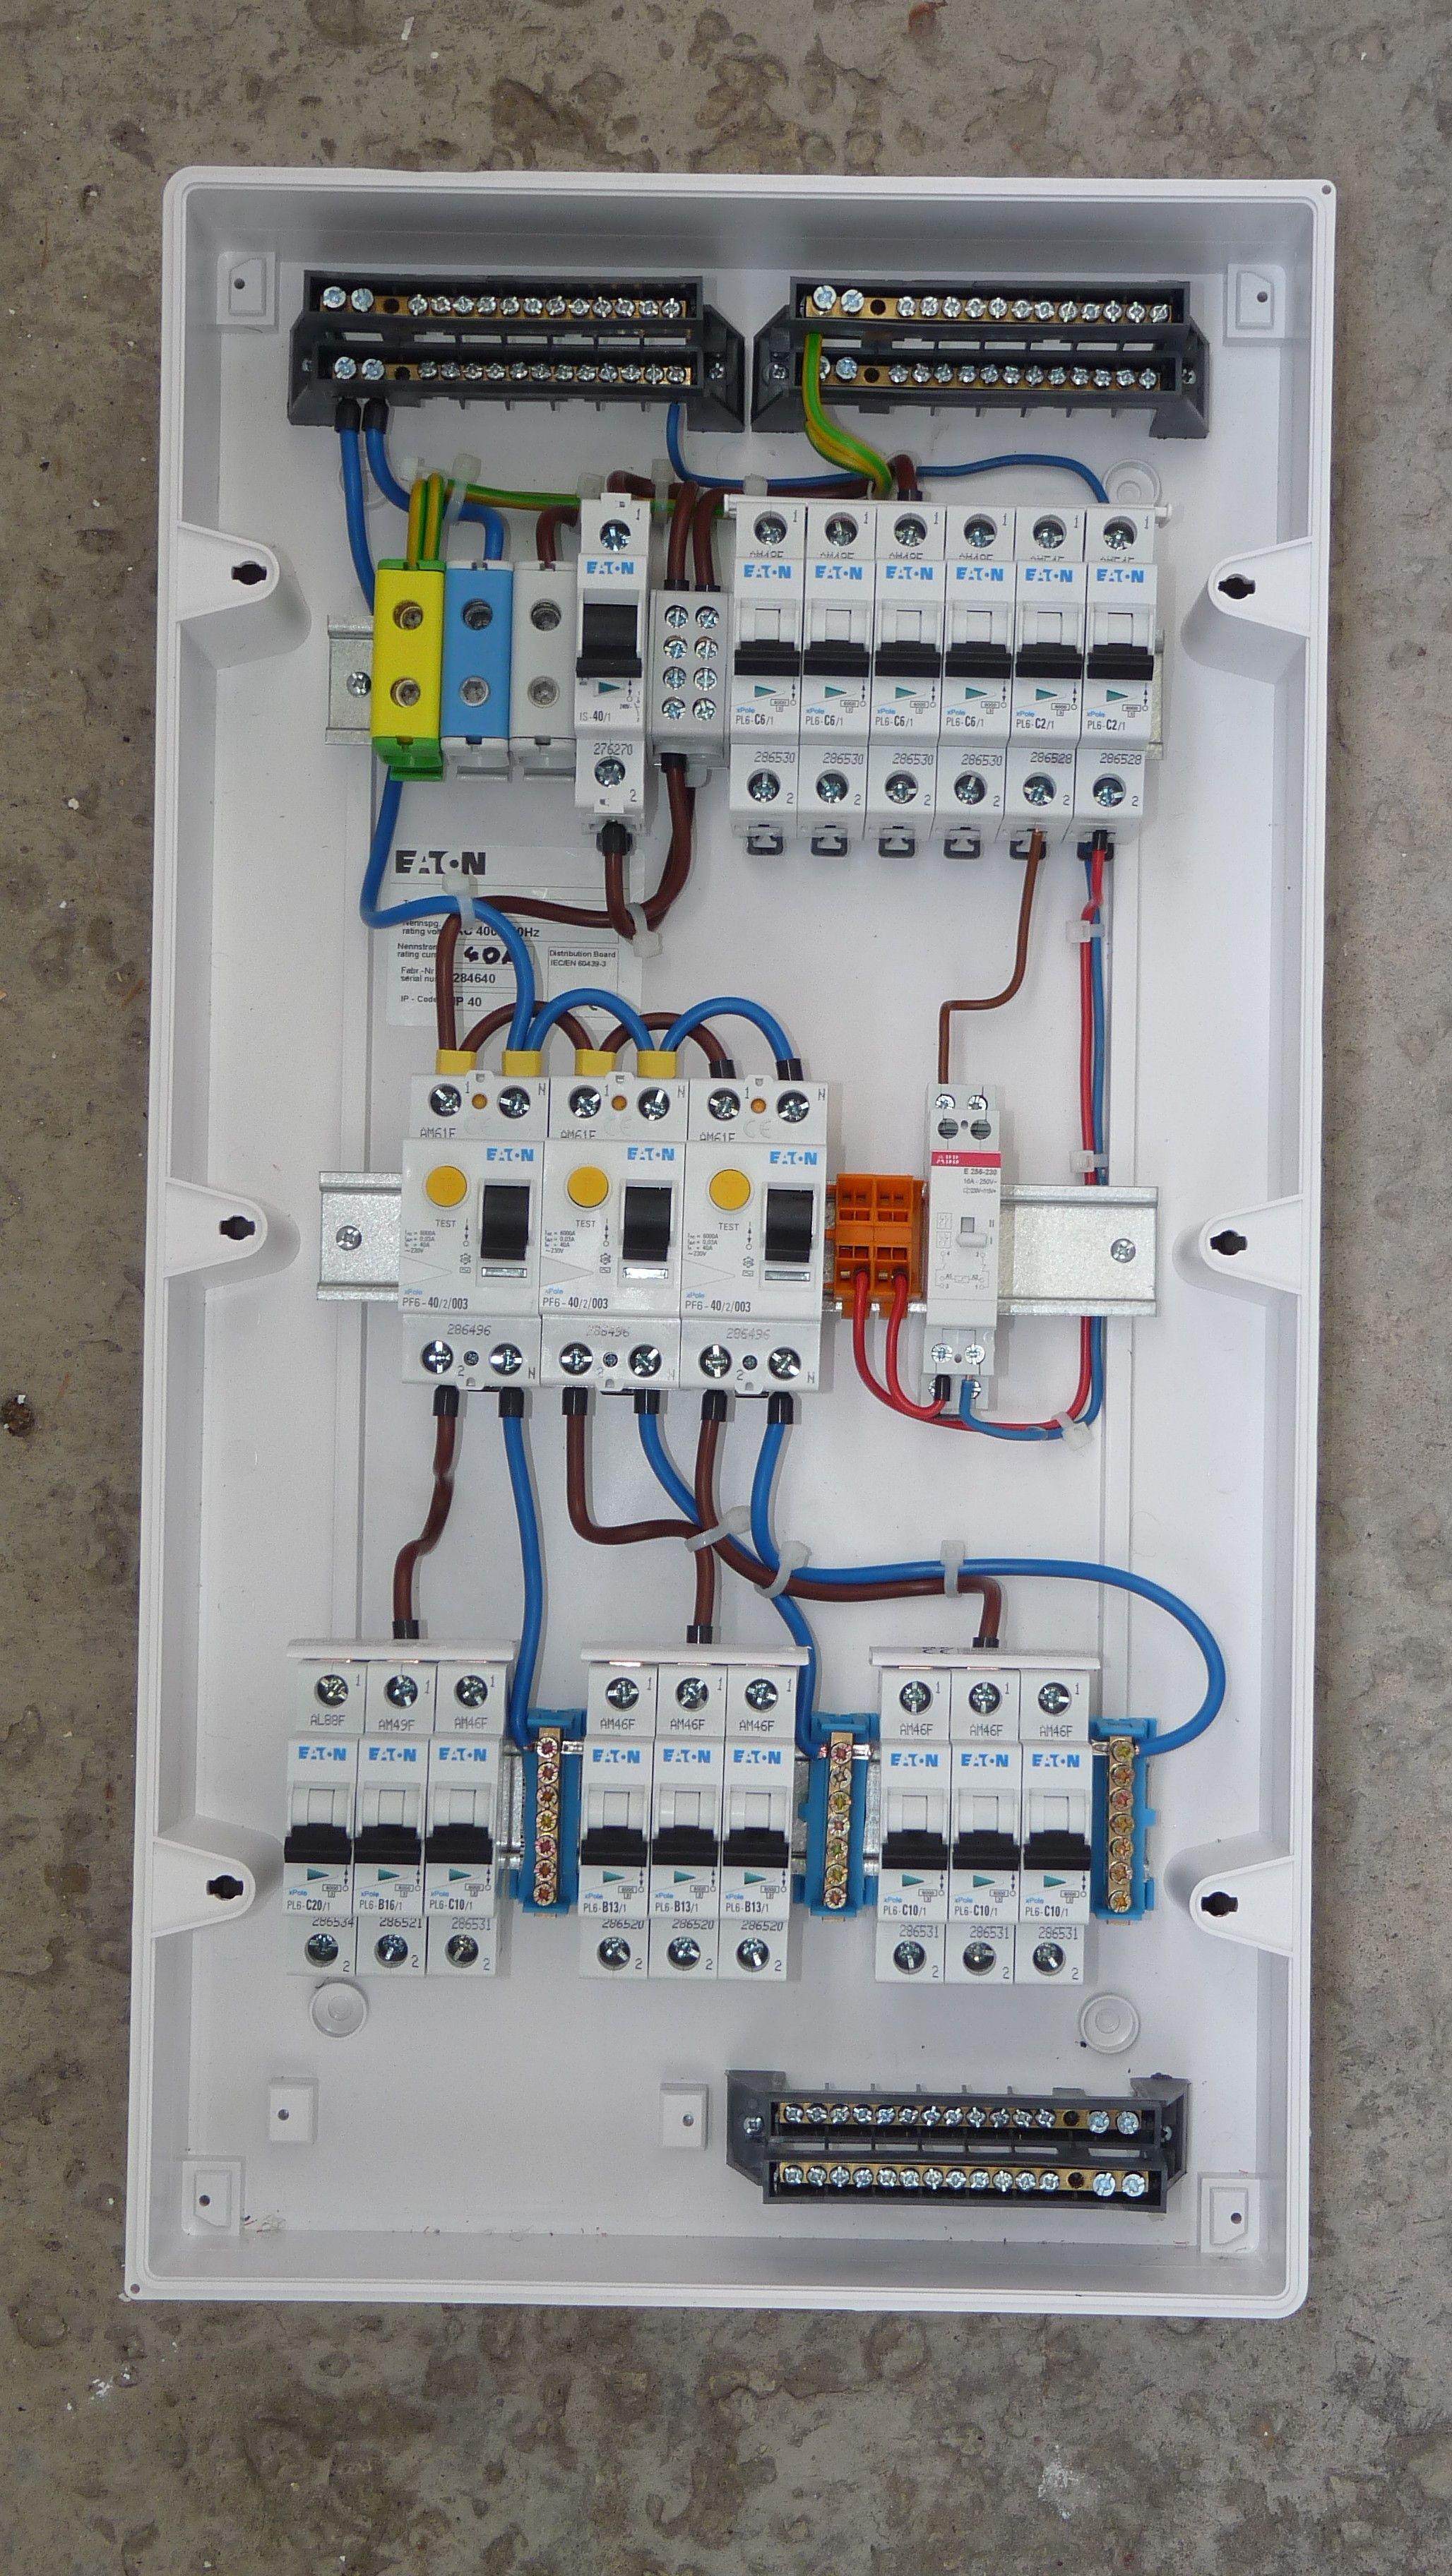 hight resolution of electrical consumer unit wiring diagram diagram diagramtemplate diagramsample